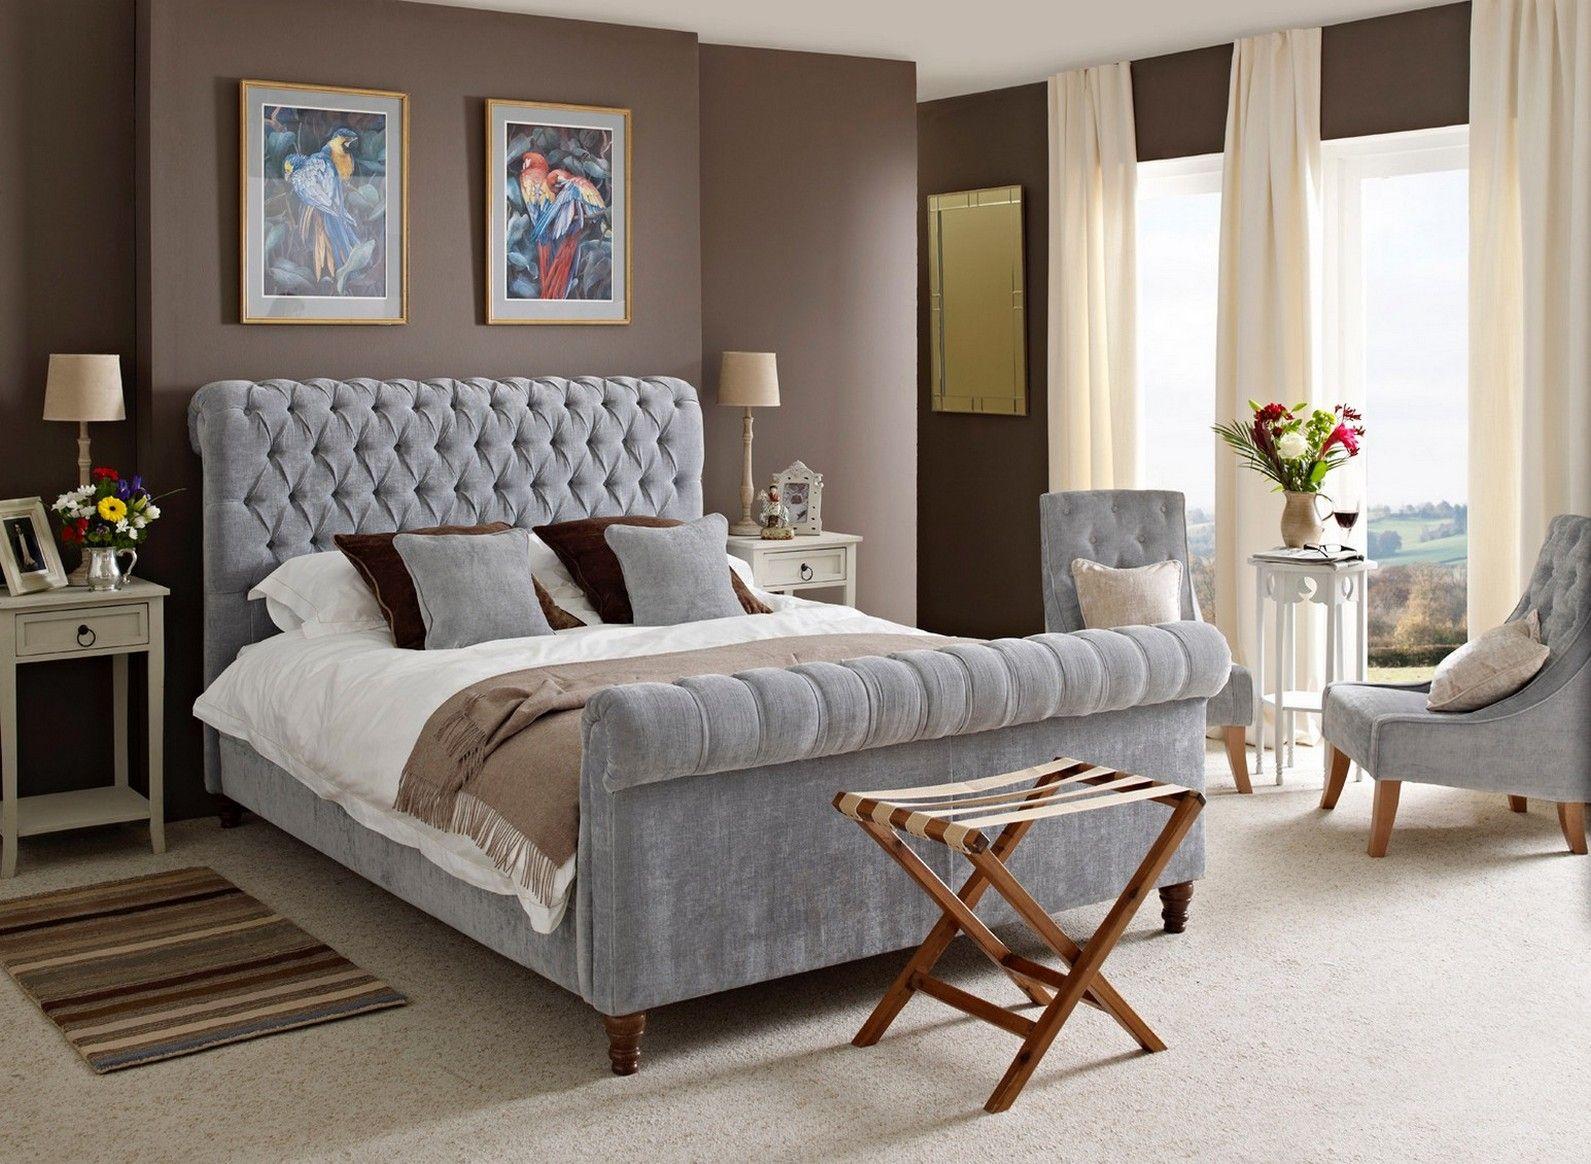 40 ways small bedroom to make look bigger king bedroom